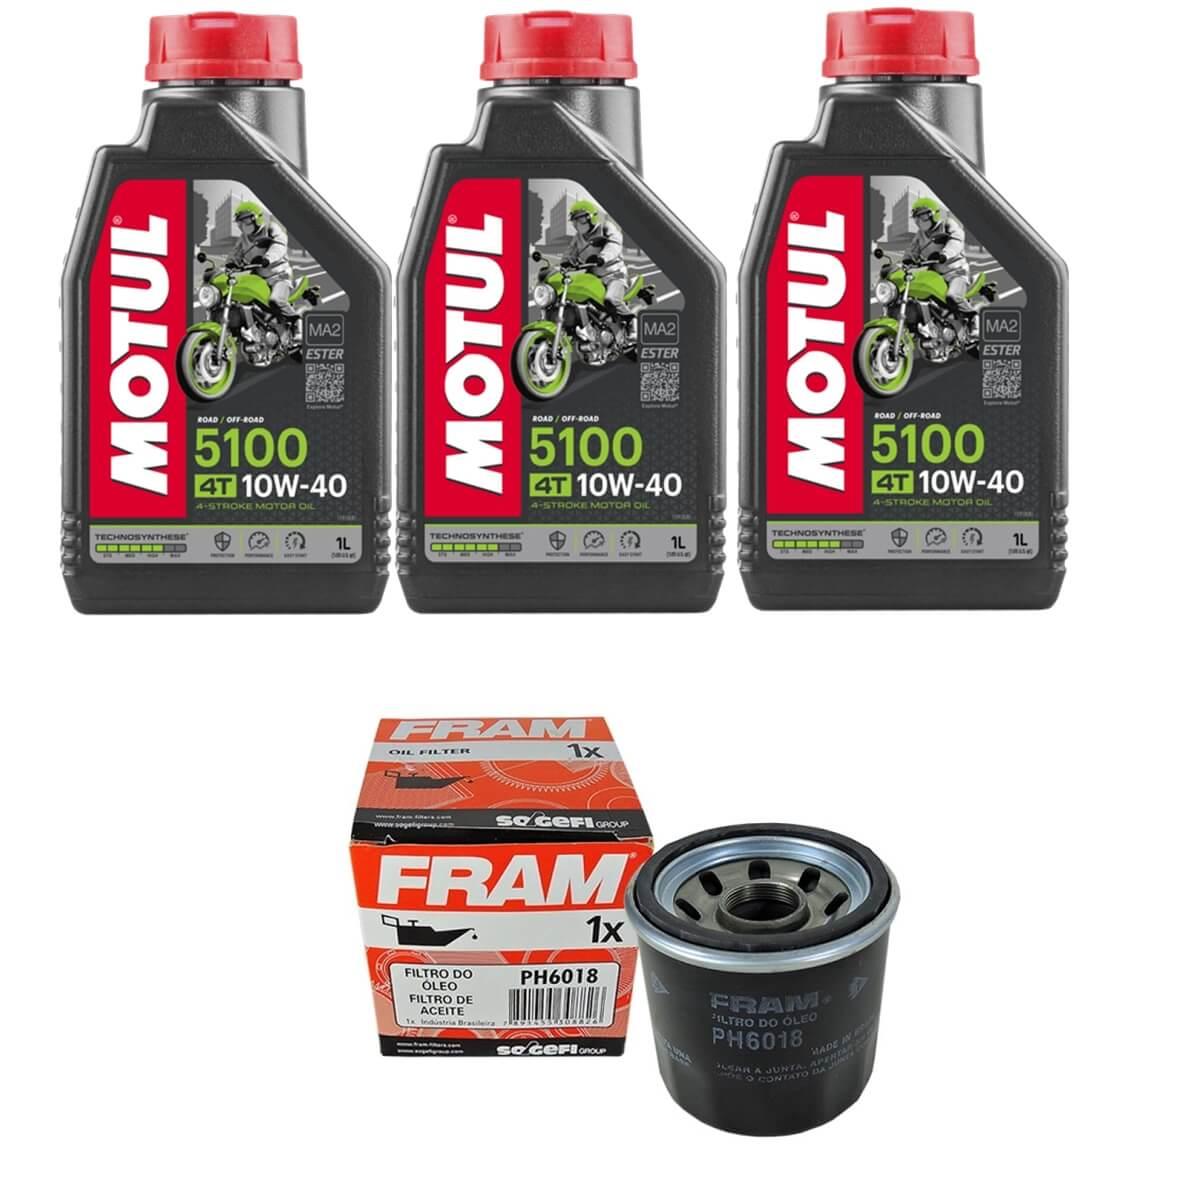 Troca Óleo Motul 5100 10w40 4t 3l + Filtro Fram PH6018 em até 6x sem juros